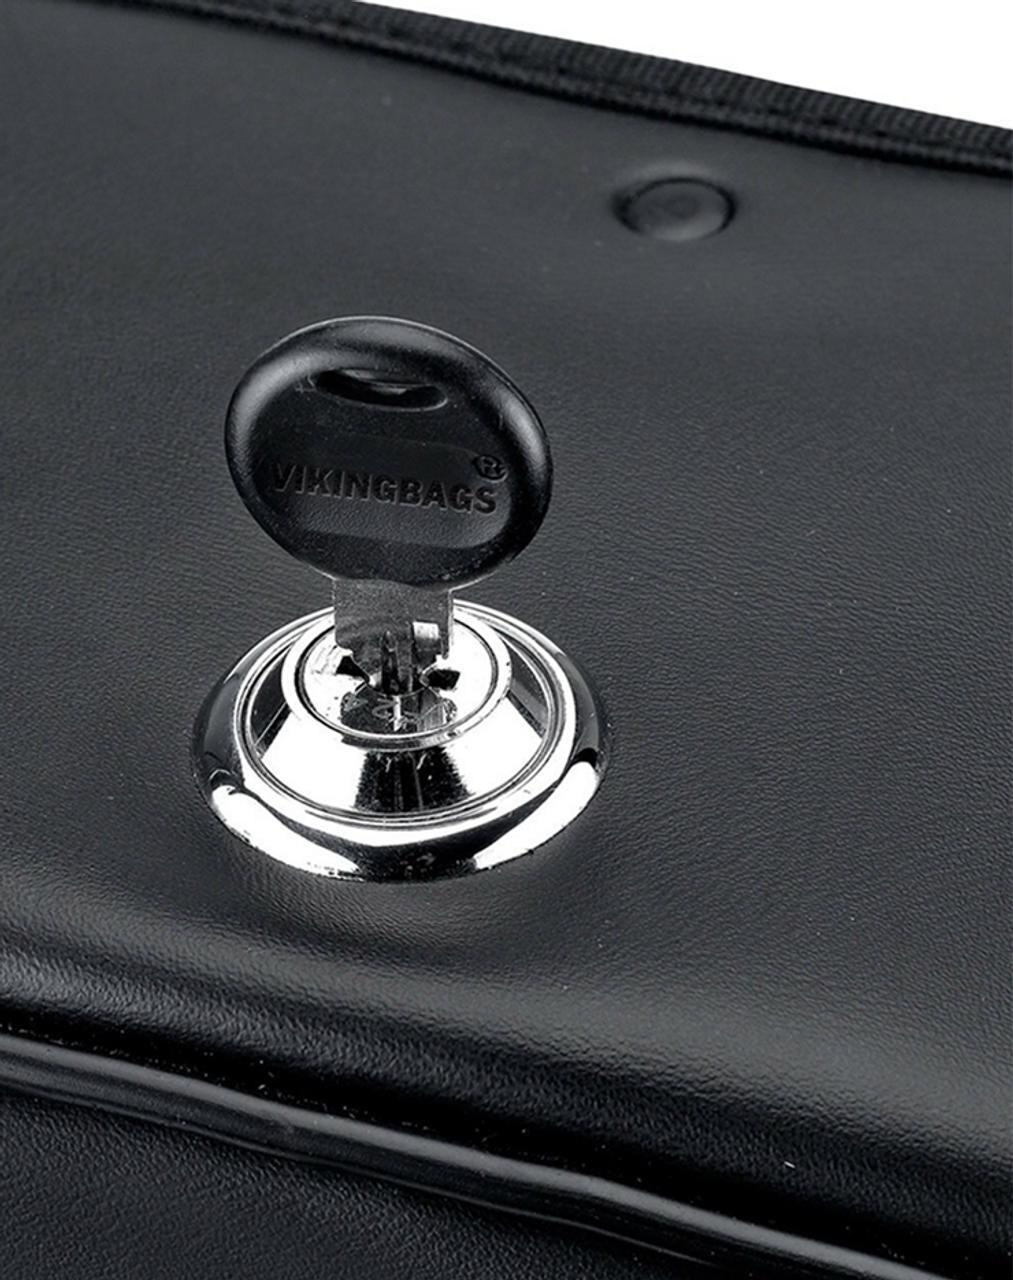 Honda 750 Shadow Phantom Medium Charger Slanted Motorcycle Saddlebags lock key view